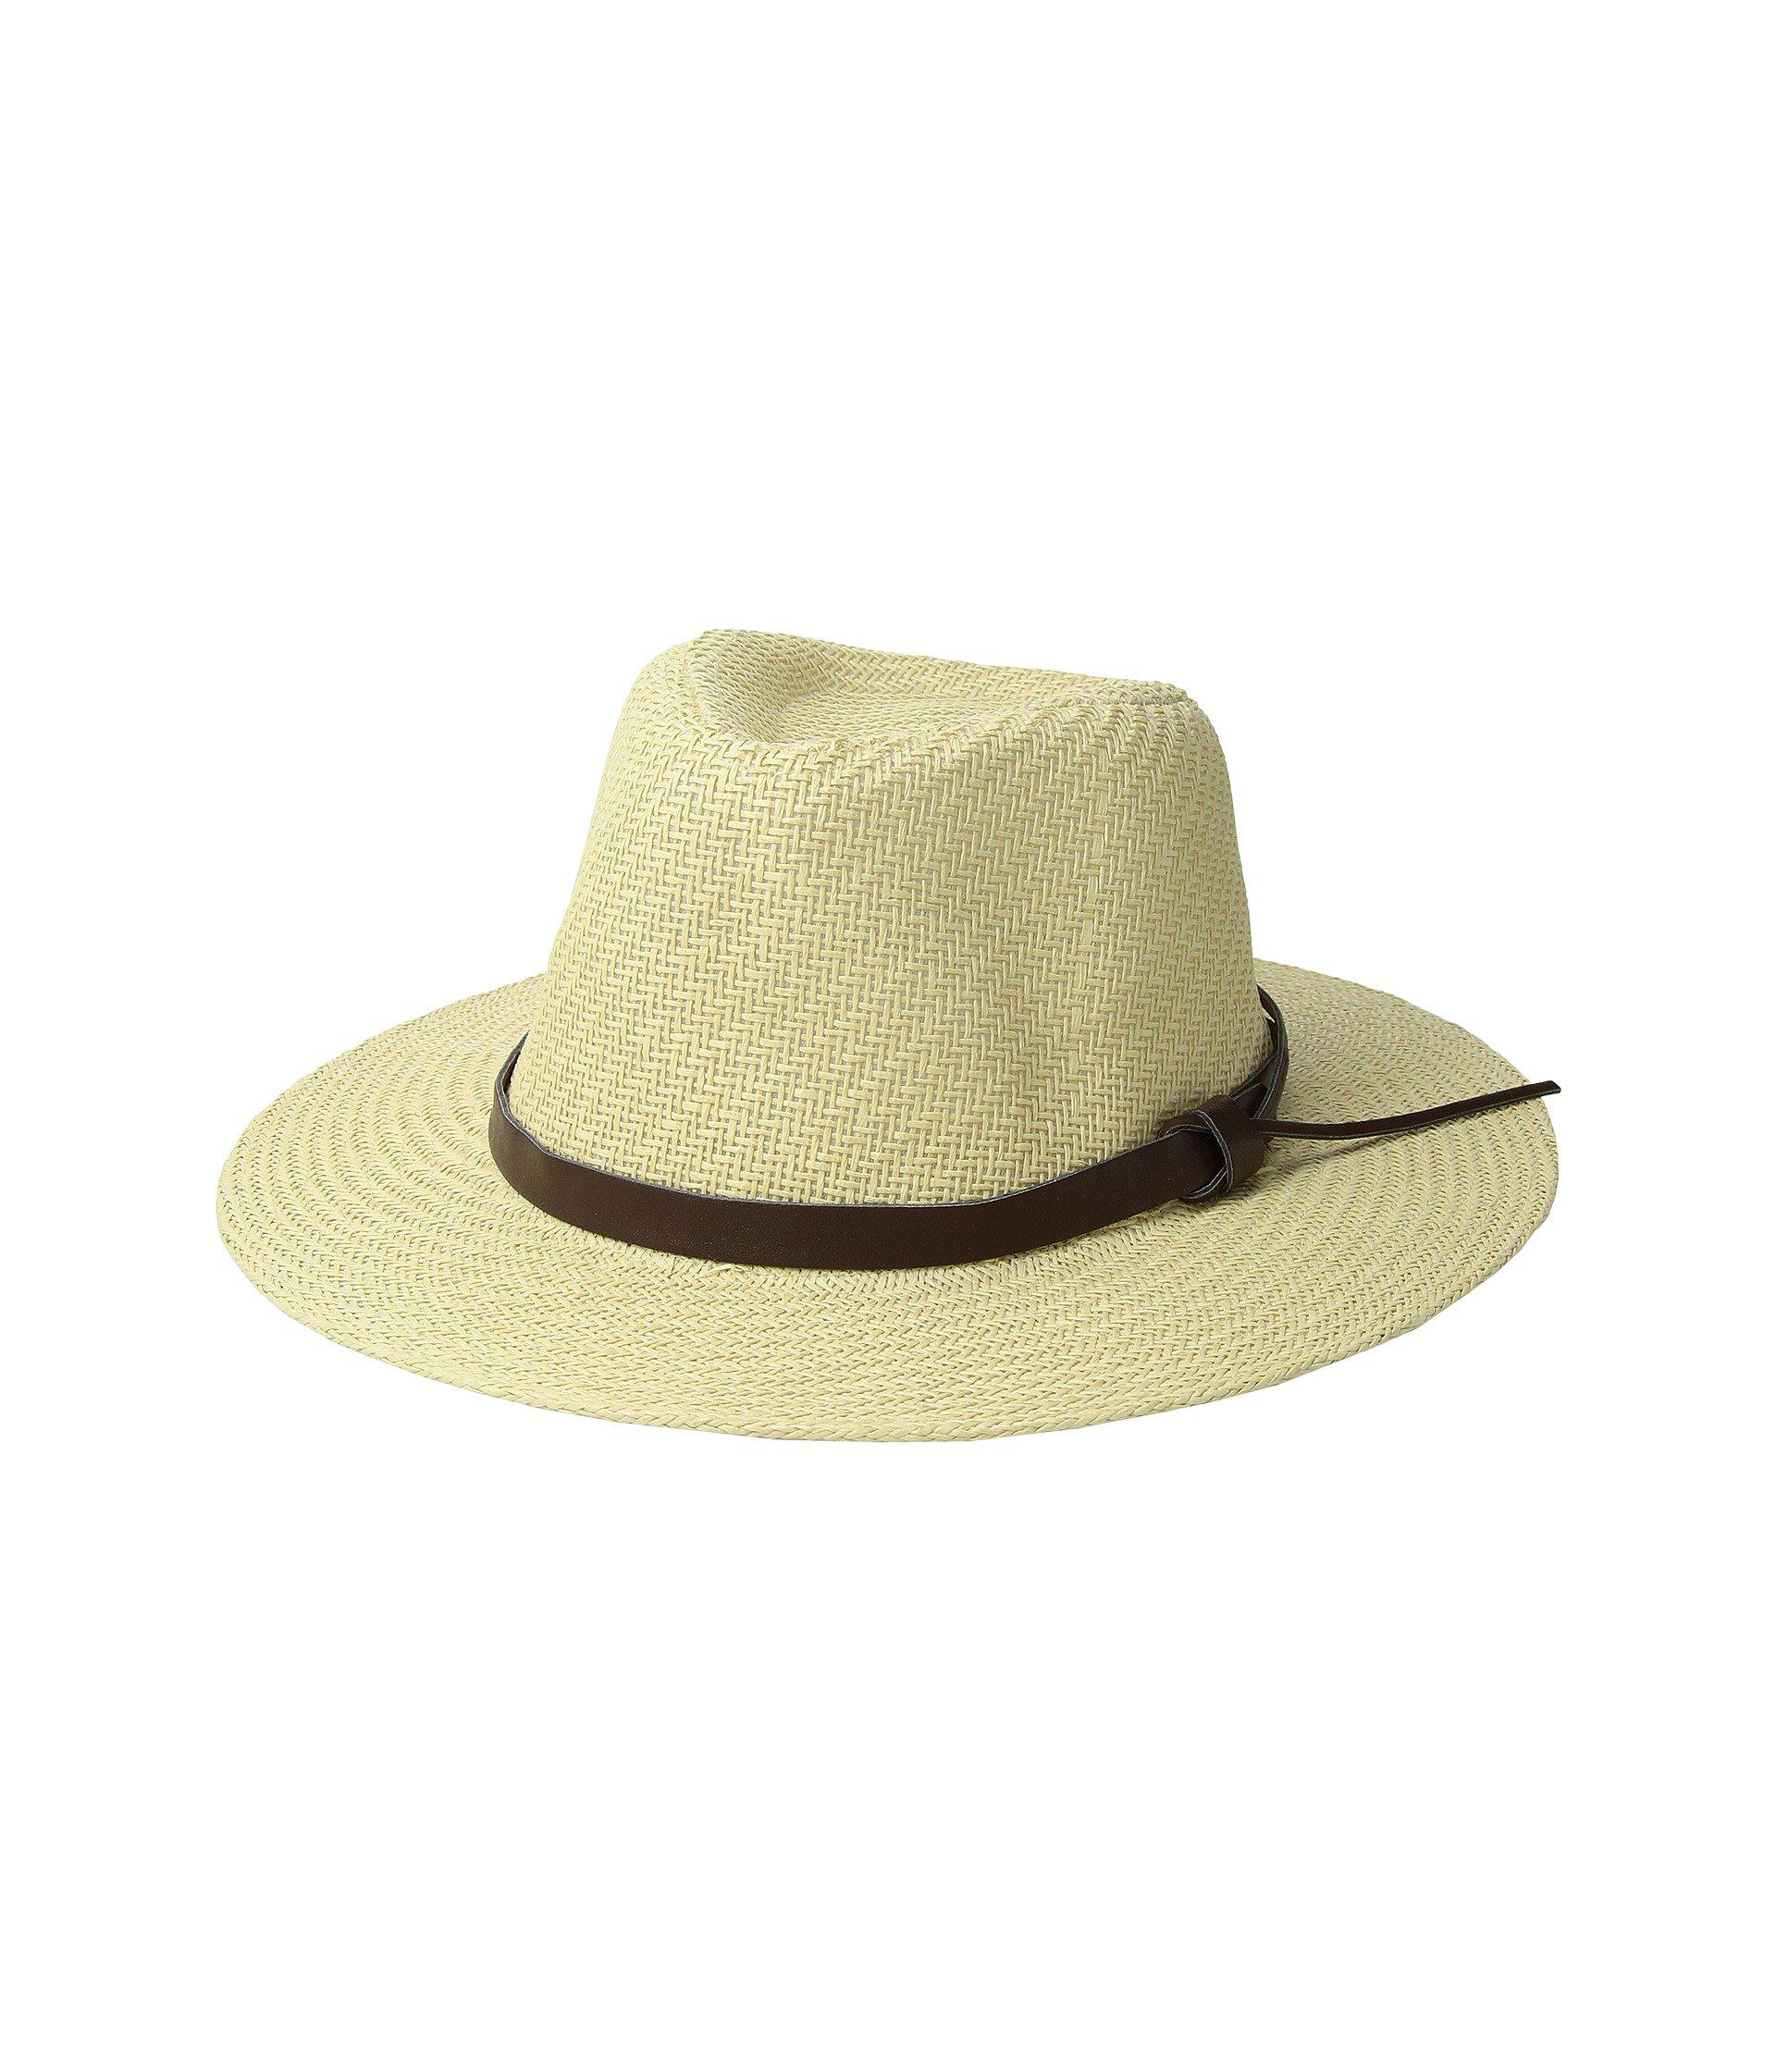 dbc9255aa9c San Diego Hat Company. Men s White Cut Sew Paper Fedora W  Faux Leather Band  ...